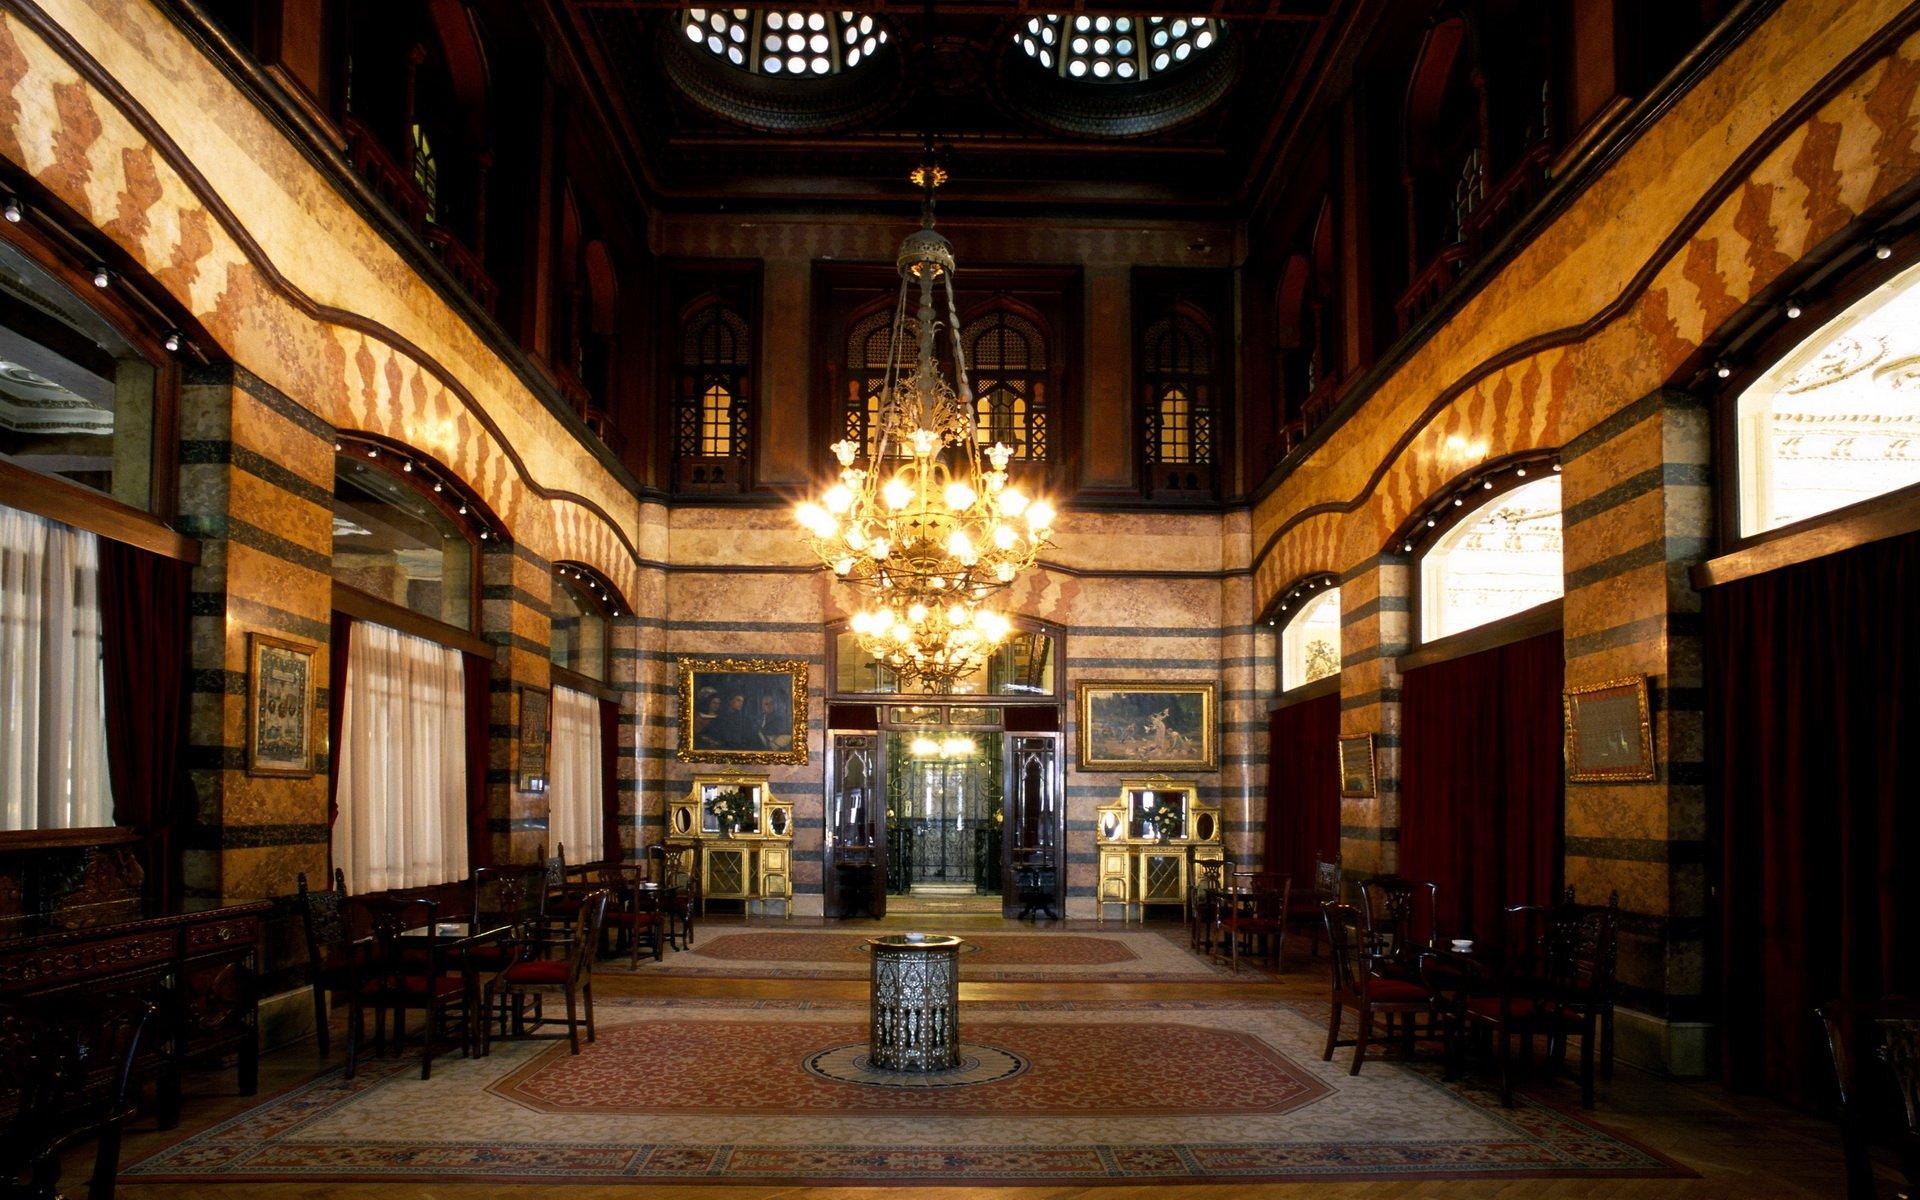 Inside Iphone X Wallpaper Old Pera Quarter Pera Palas Hotel Agatha Christie